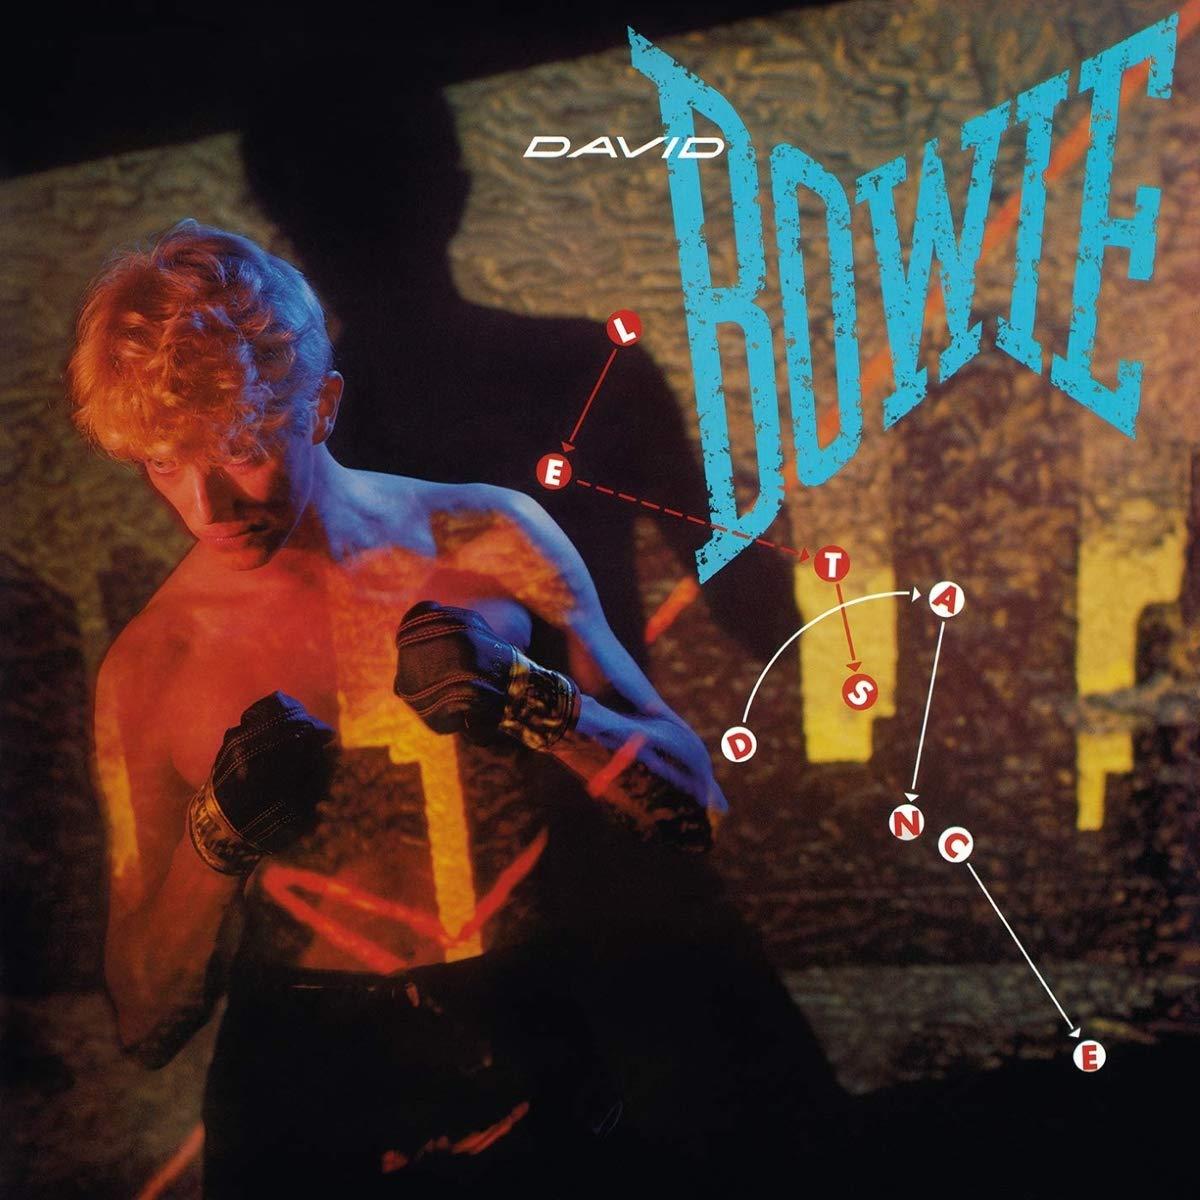 Copertina Vinile 33 giri Let's Dance di David Bowie